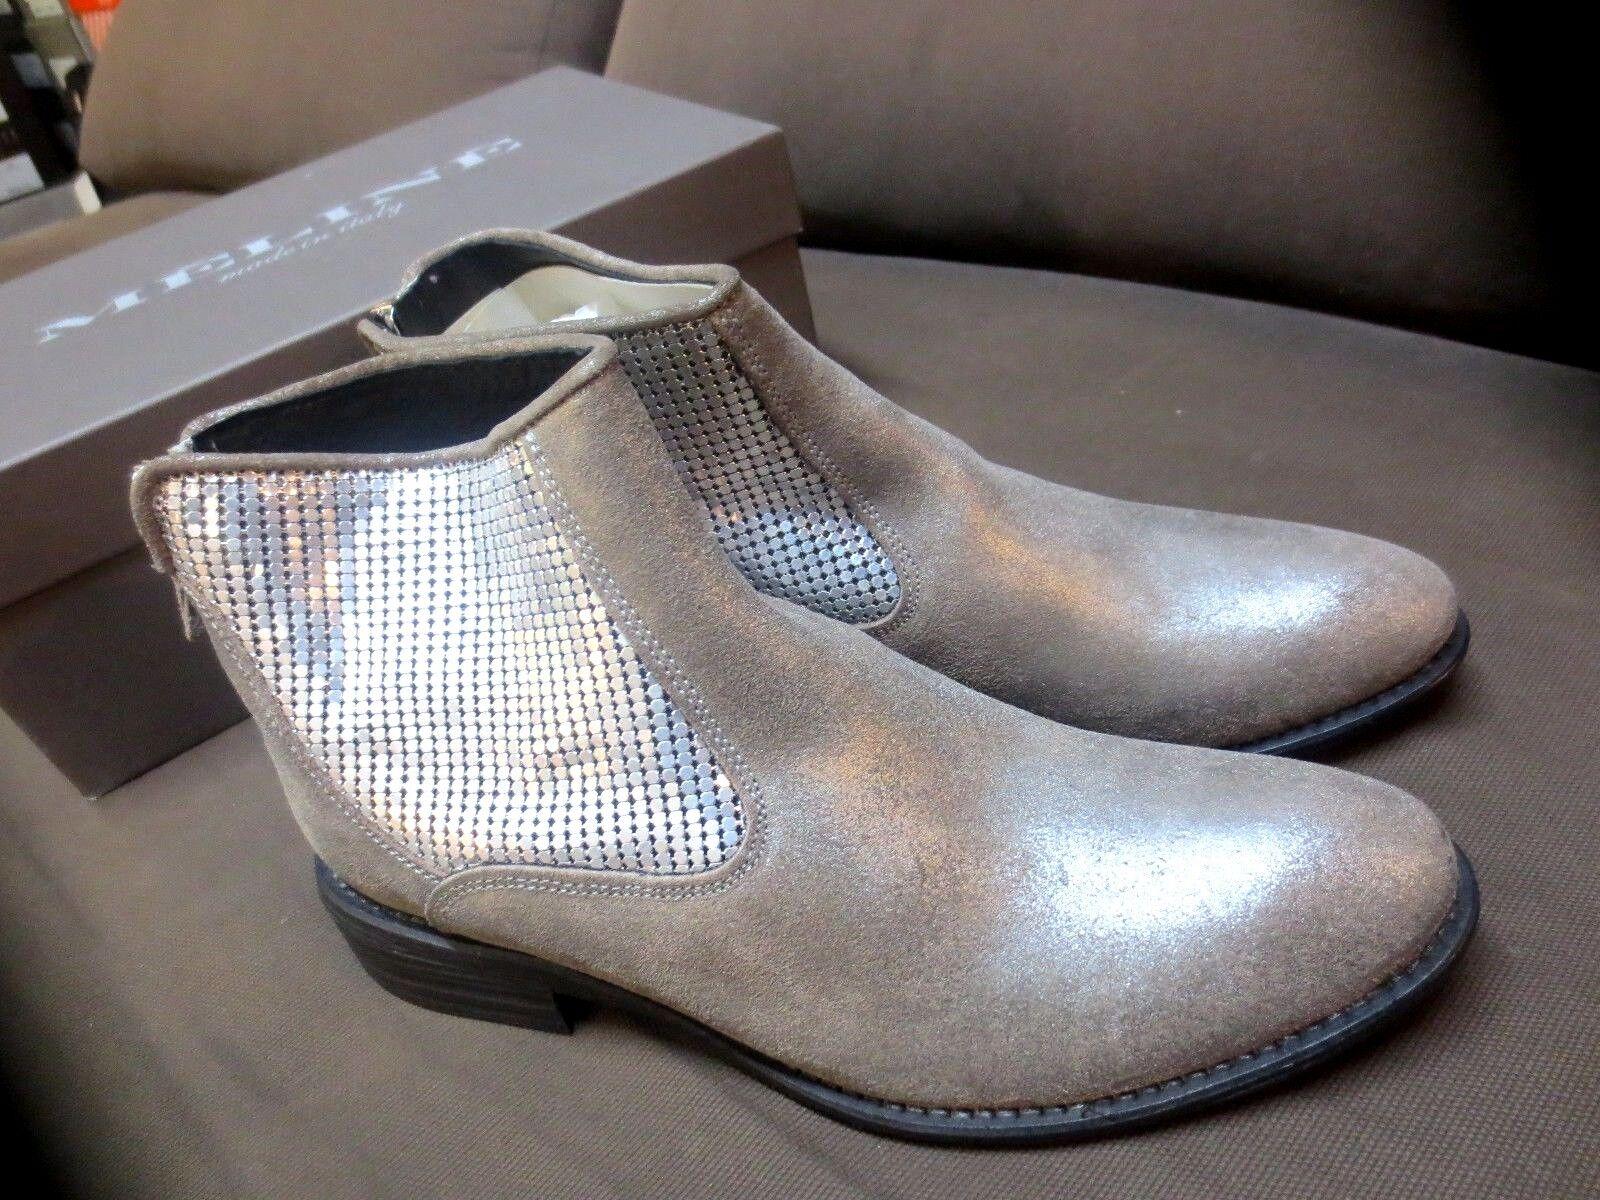 MELINE botas botas botas pelle platino nuove valore 149E Numeri 35,36 1f4af1